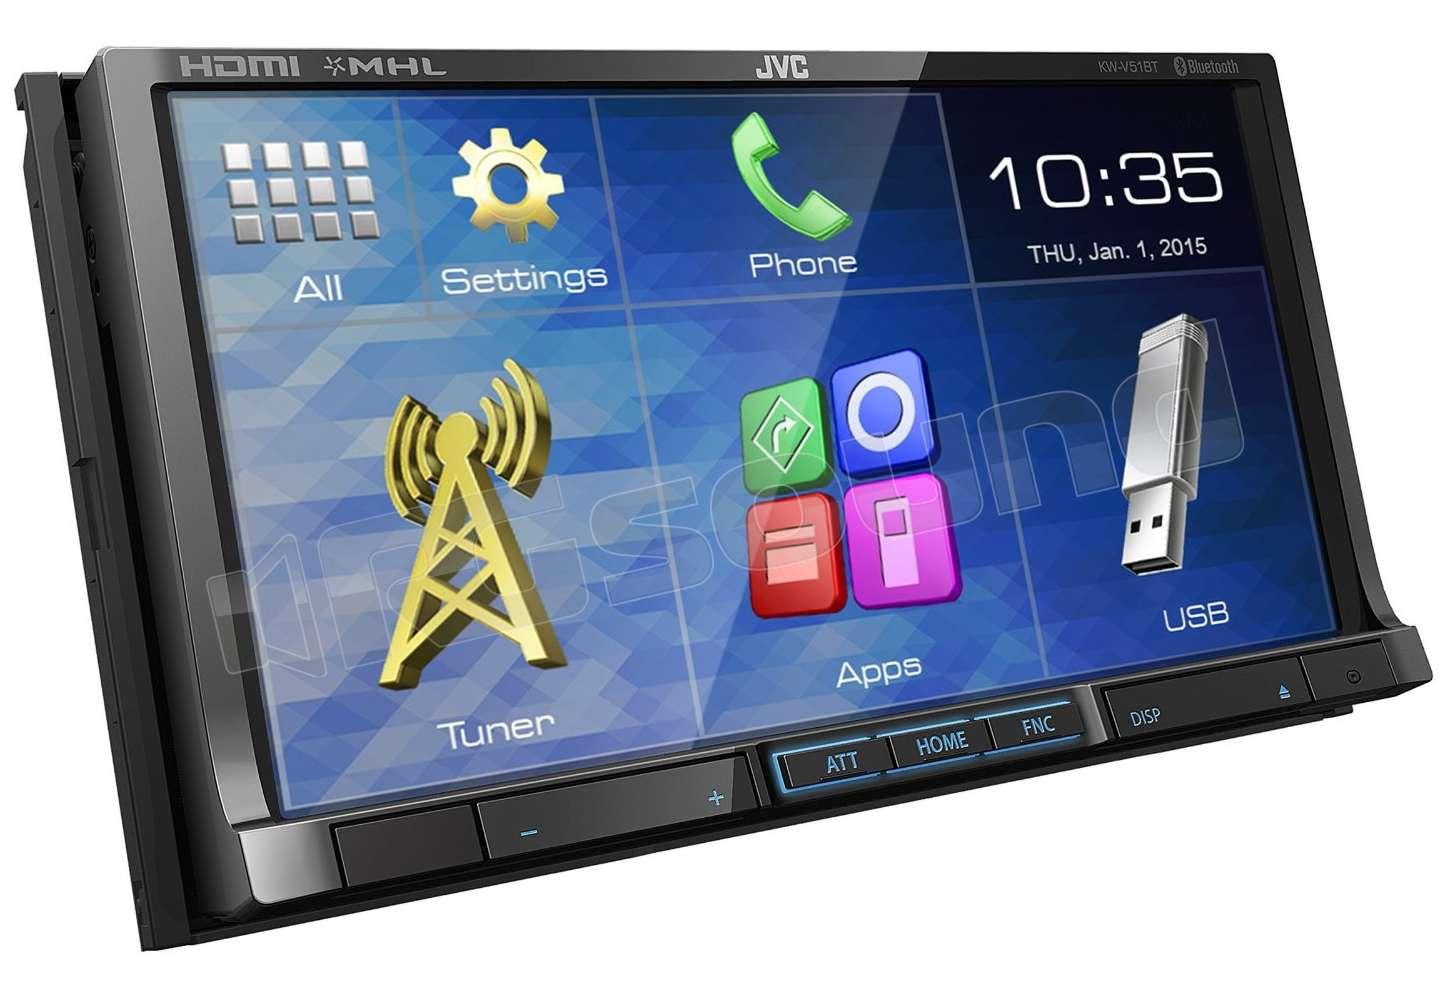 Jvc Cavo Hdmi Ks-U60 Elettronica per veicoli Elettronica ...